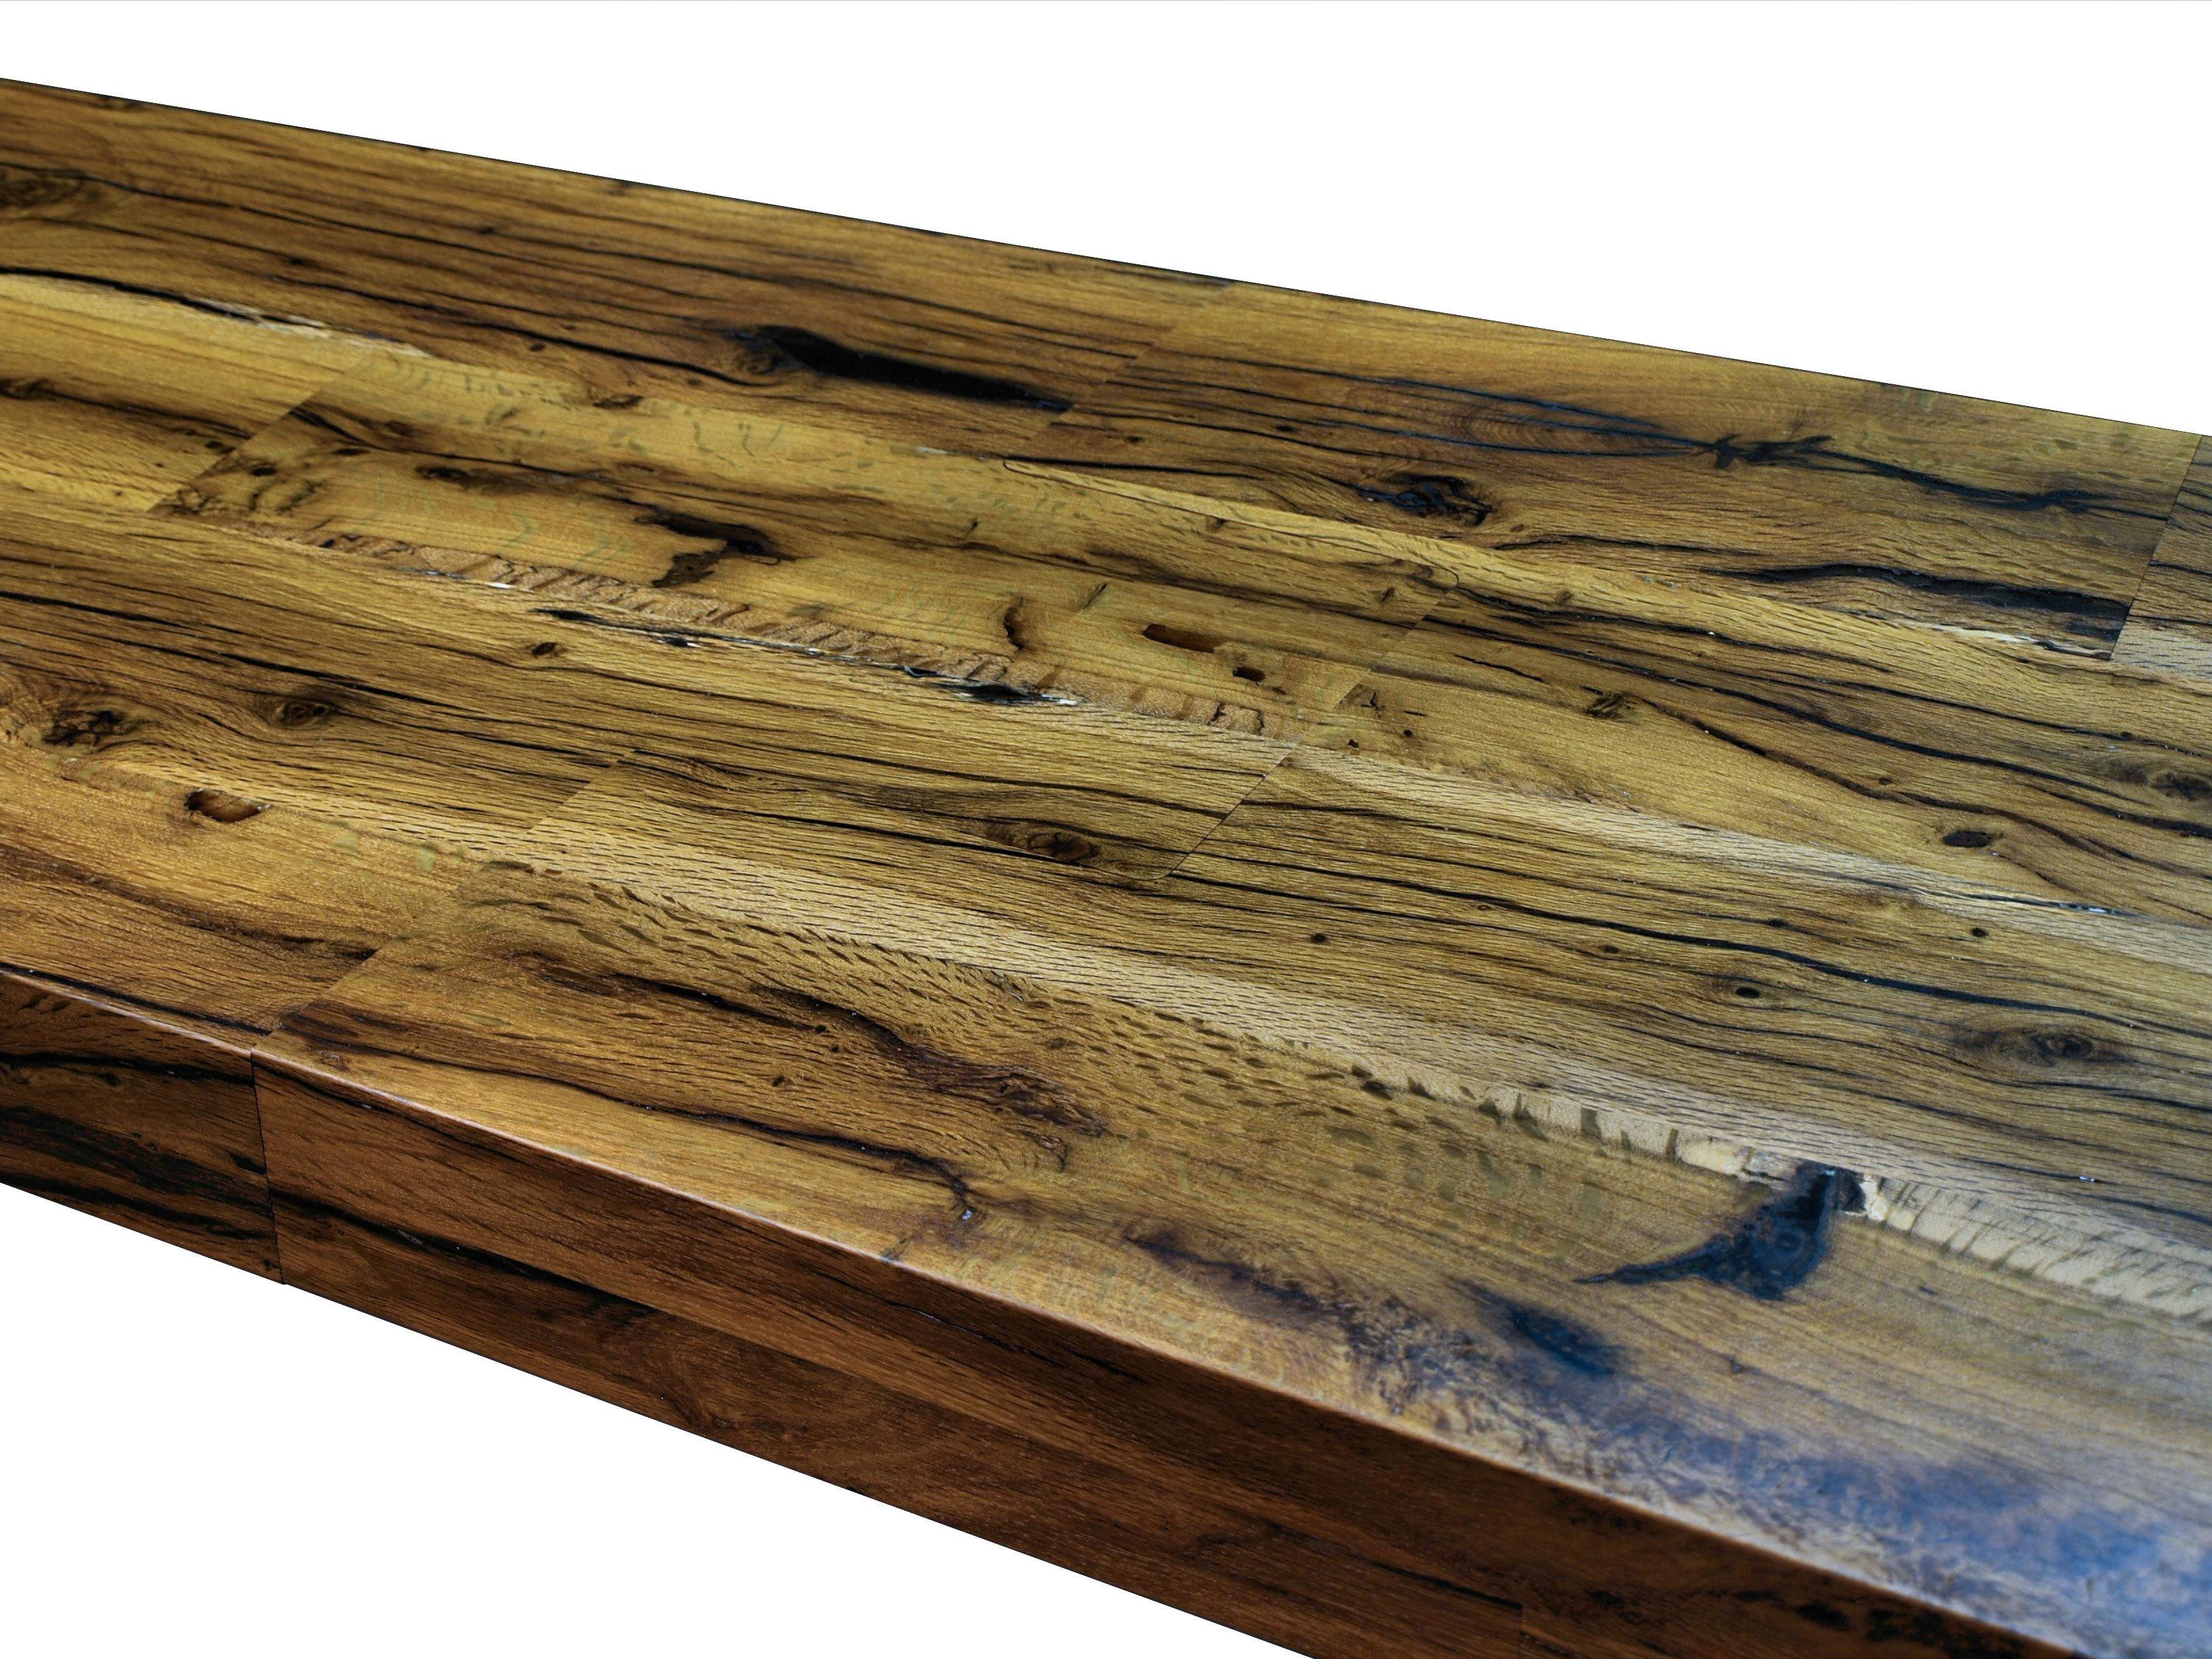 Oak Wood Lumber ~ Reclaimed white oak wood countertop photo gallery by